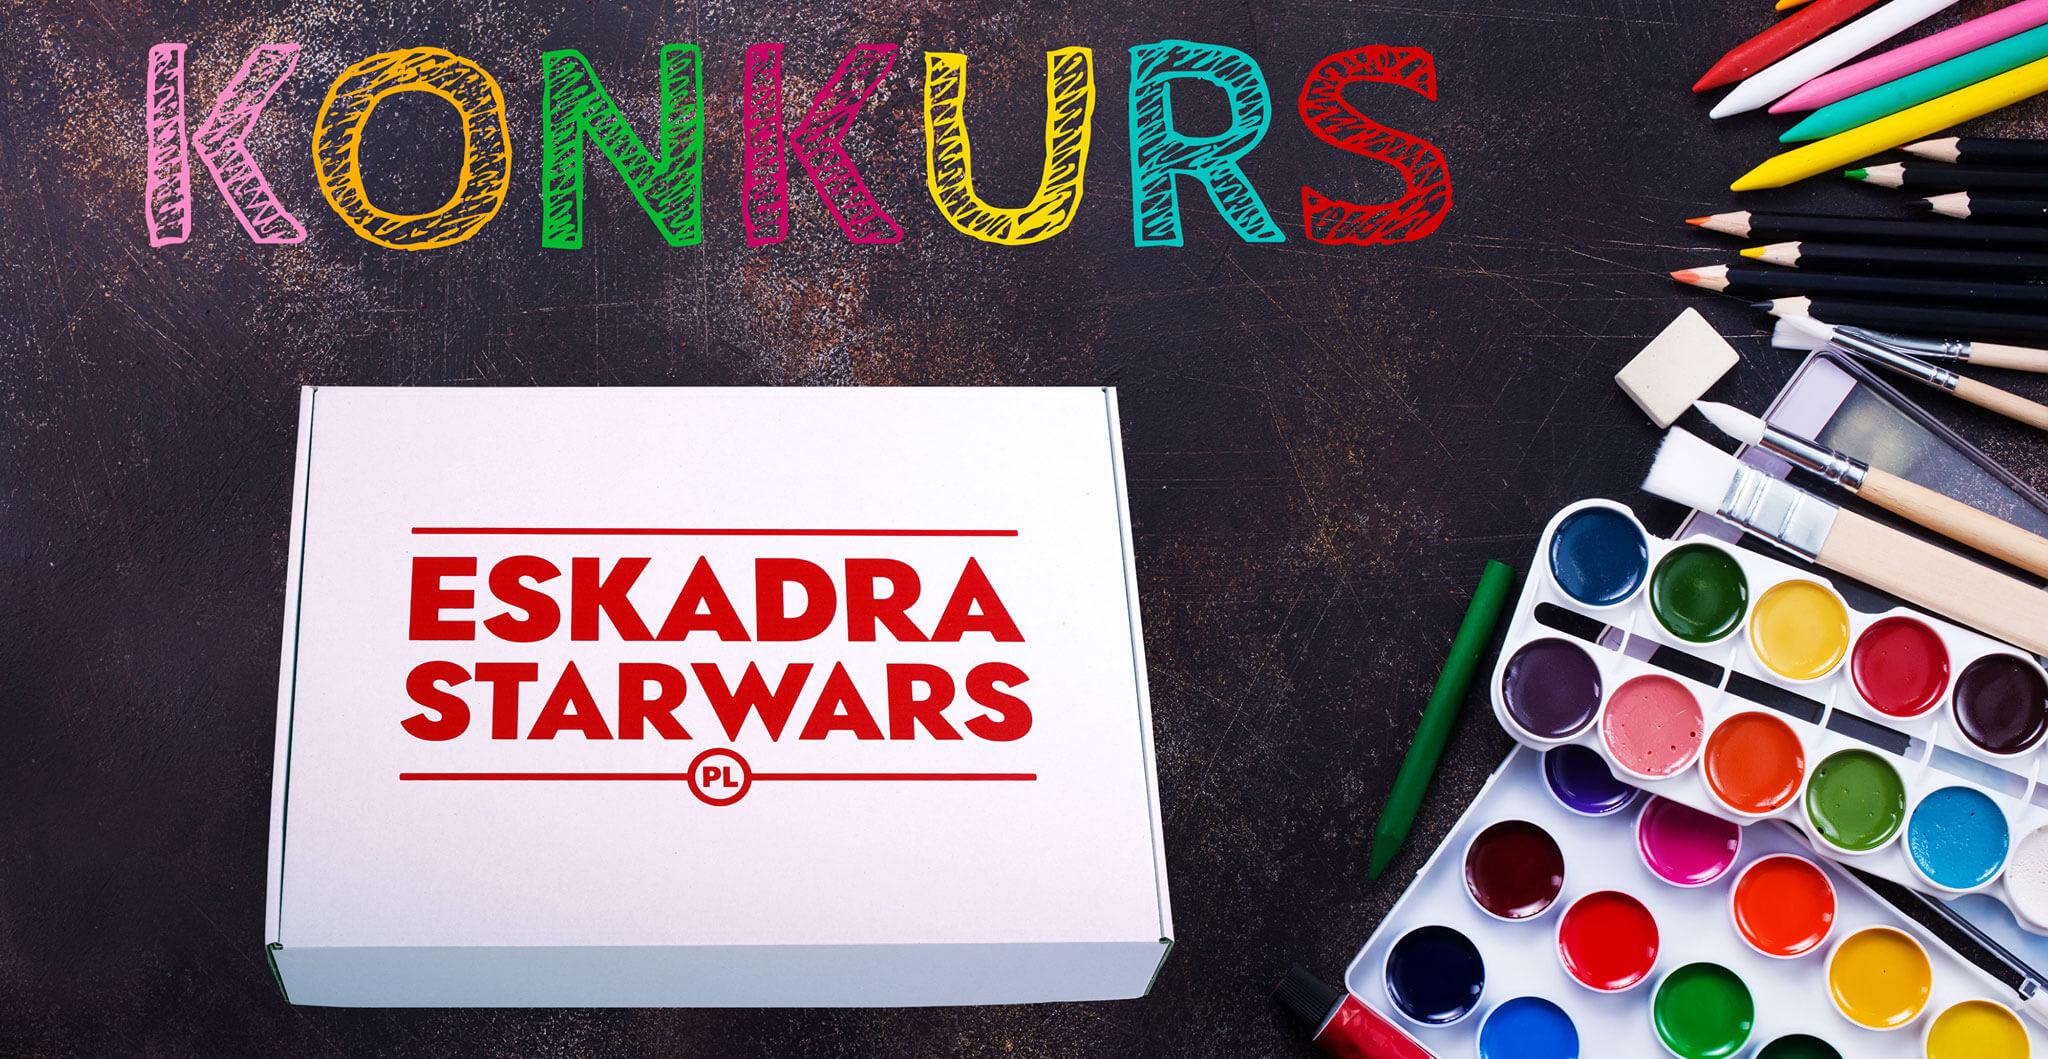 Grudniowa Eskadra starwars.pl | KONKURS